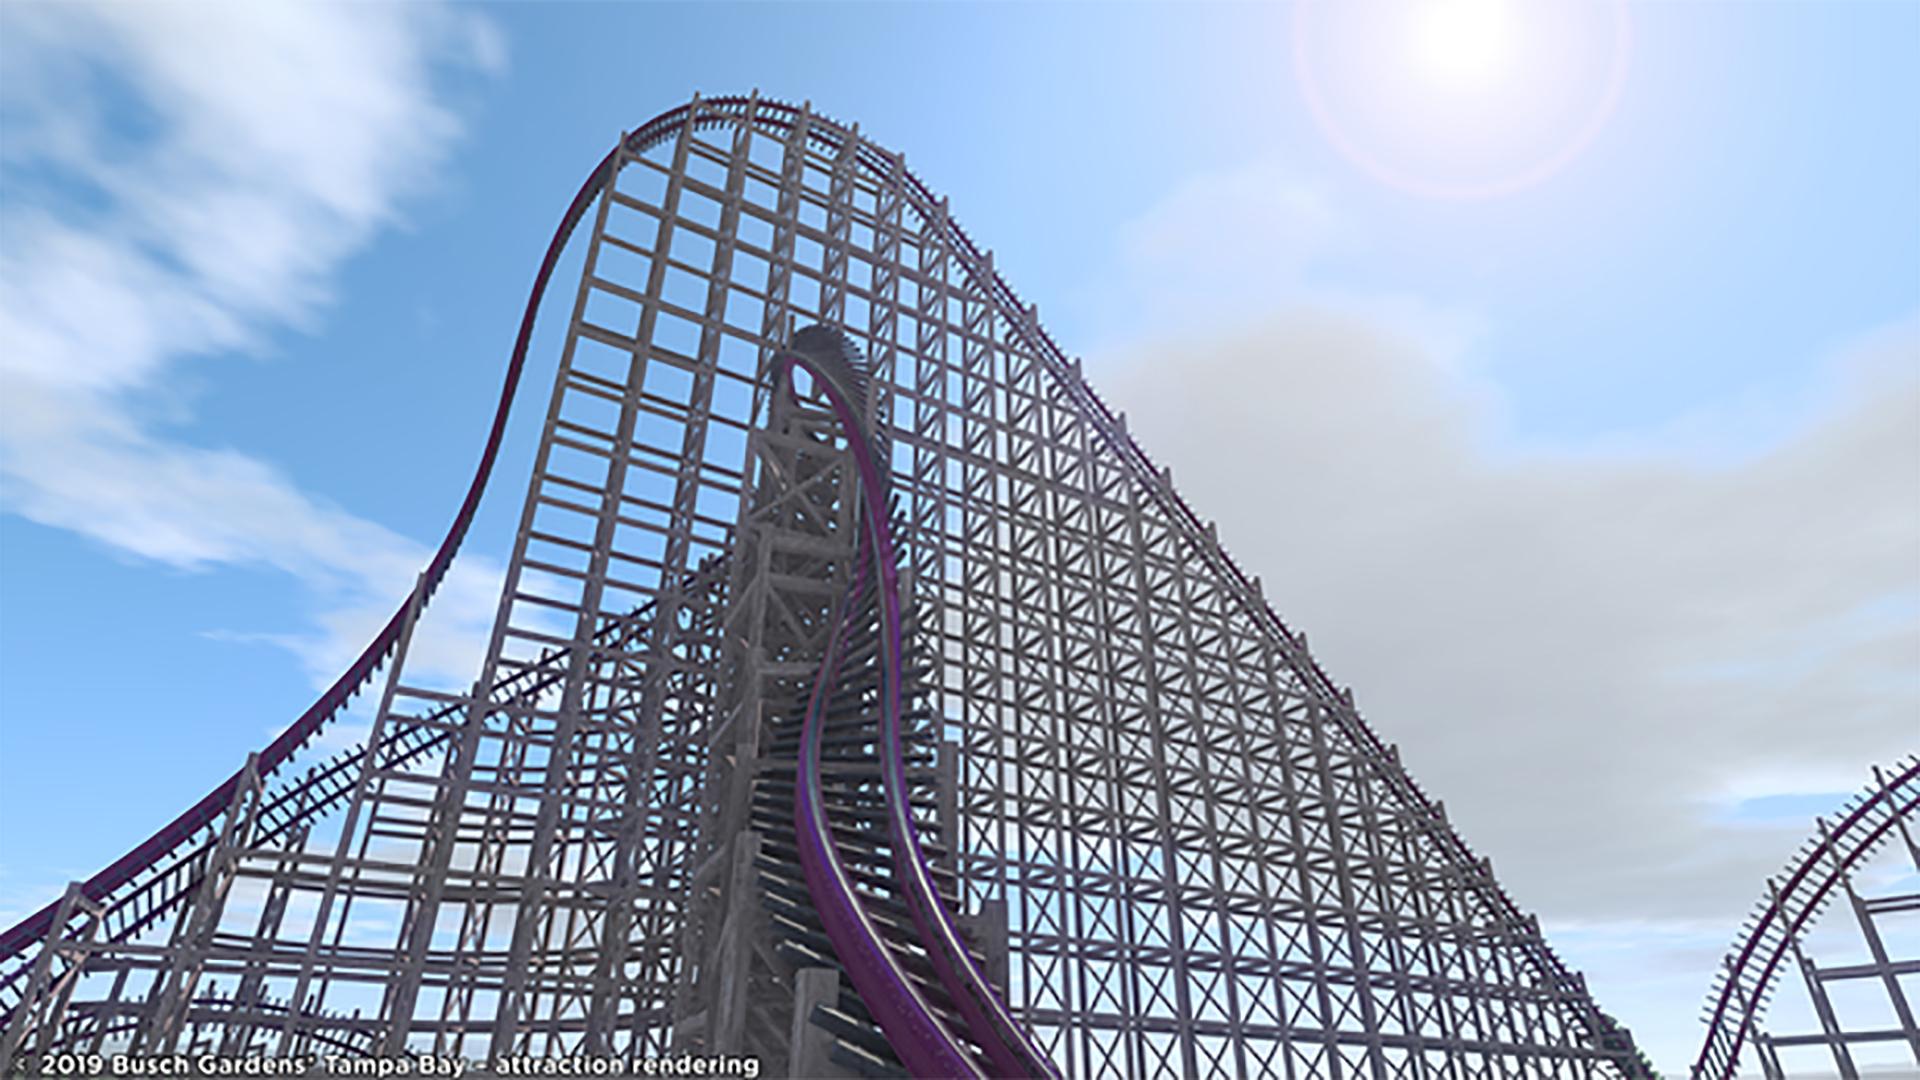 Updated Busch Gardens Coaster To Be Steepest Fastest Wooden Hybrid